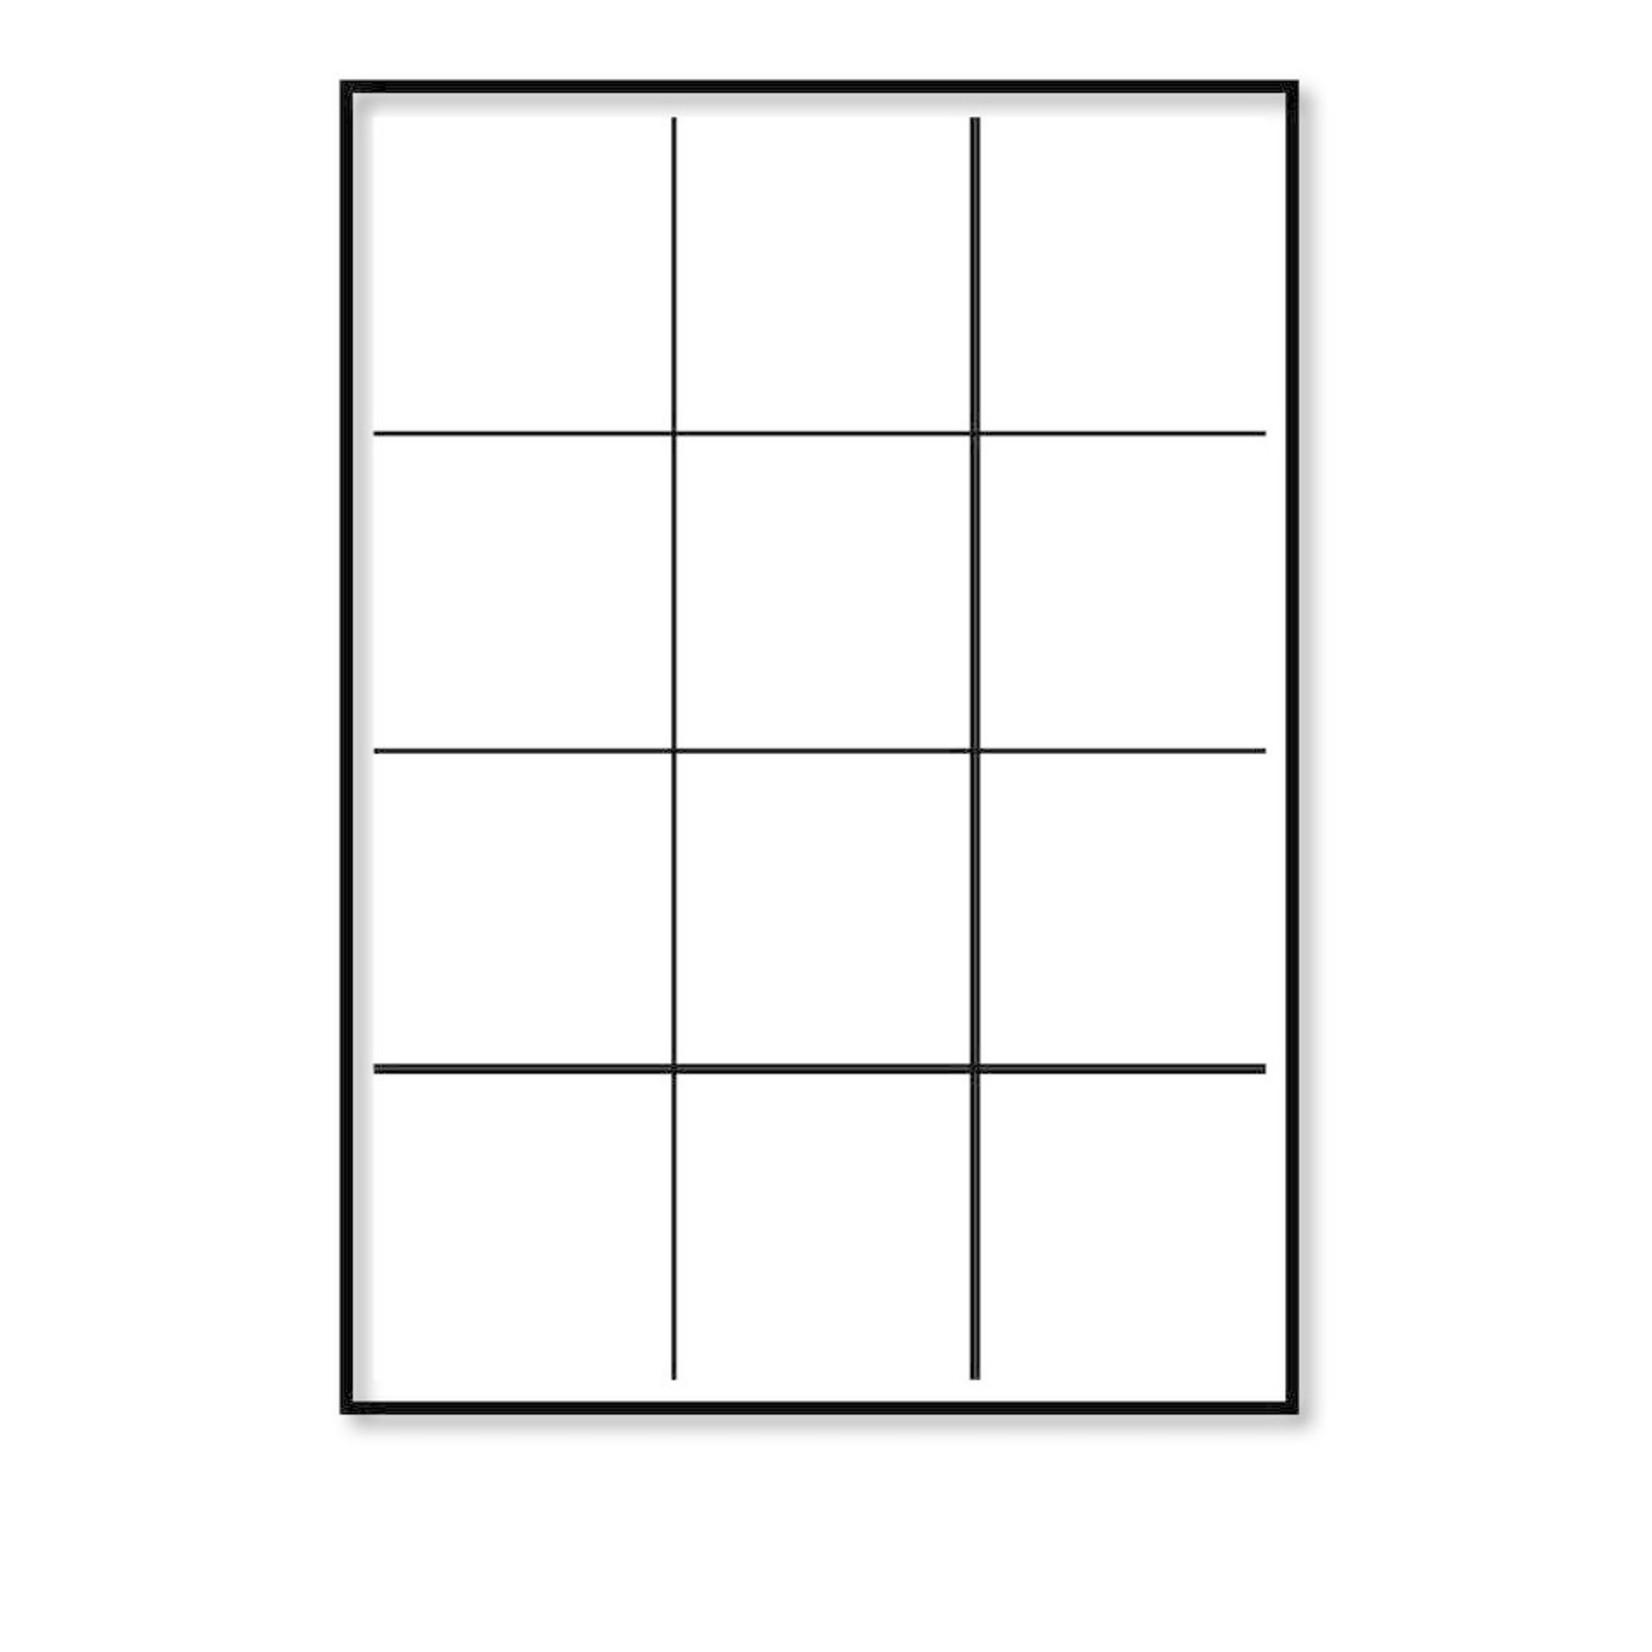 Pixelposter - Raster (A4)